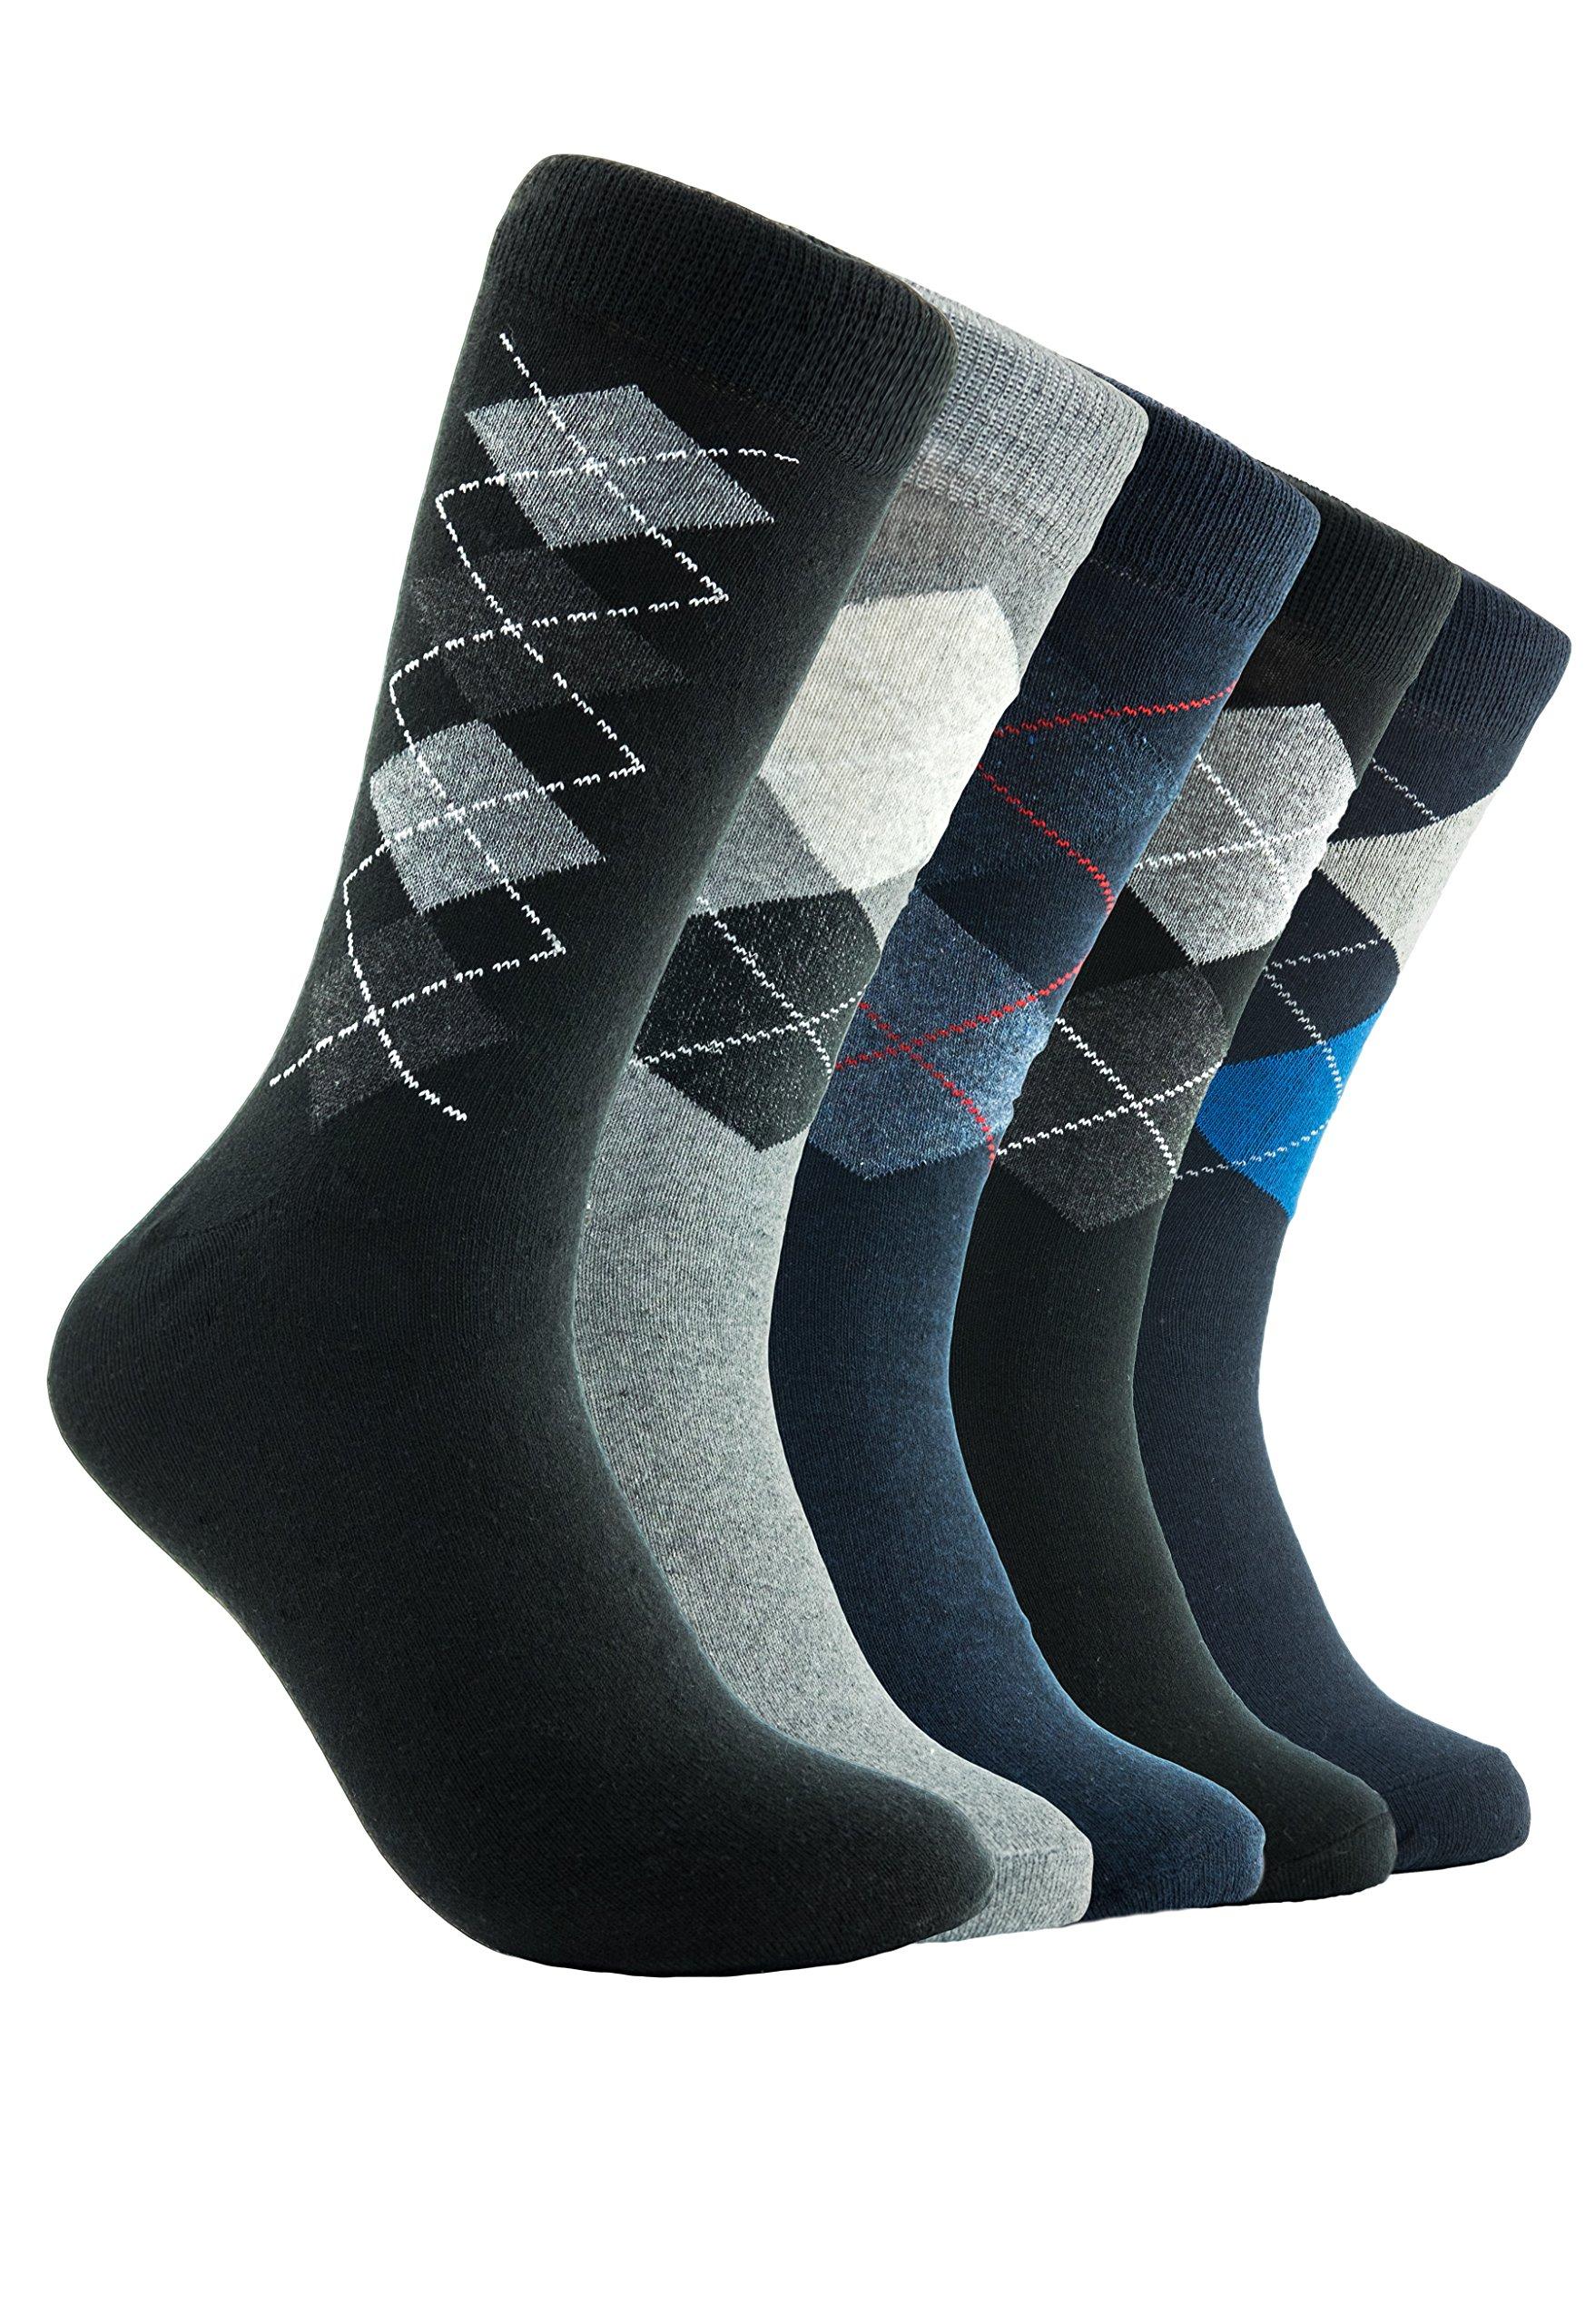 Mens Dress Socks 5 Pack Cotton Argyle Dress Socks Assorted Colors -5 Pair (10-13, Argyle)